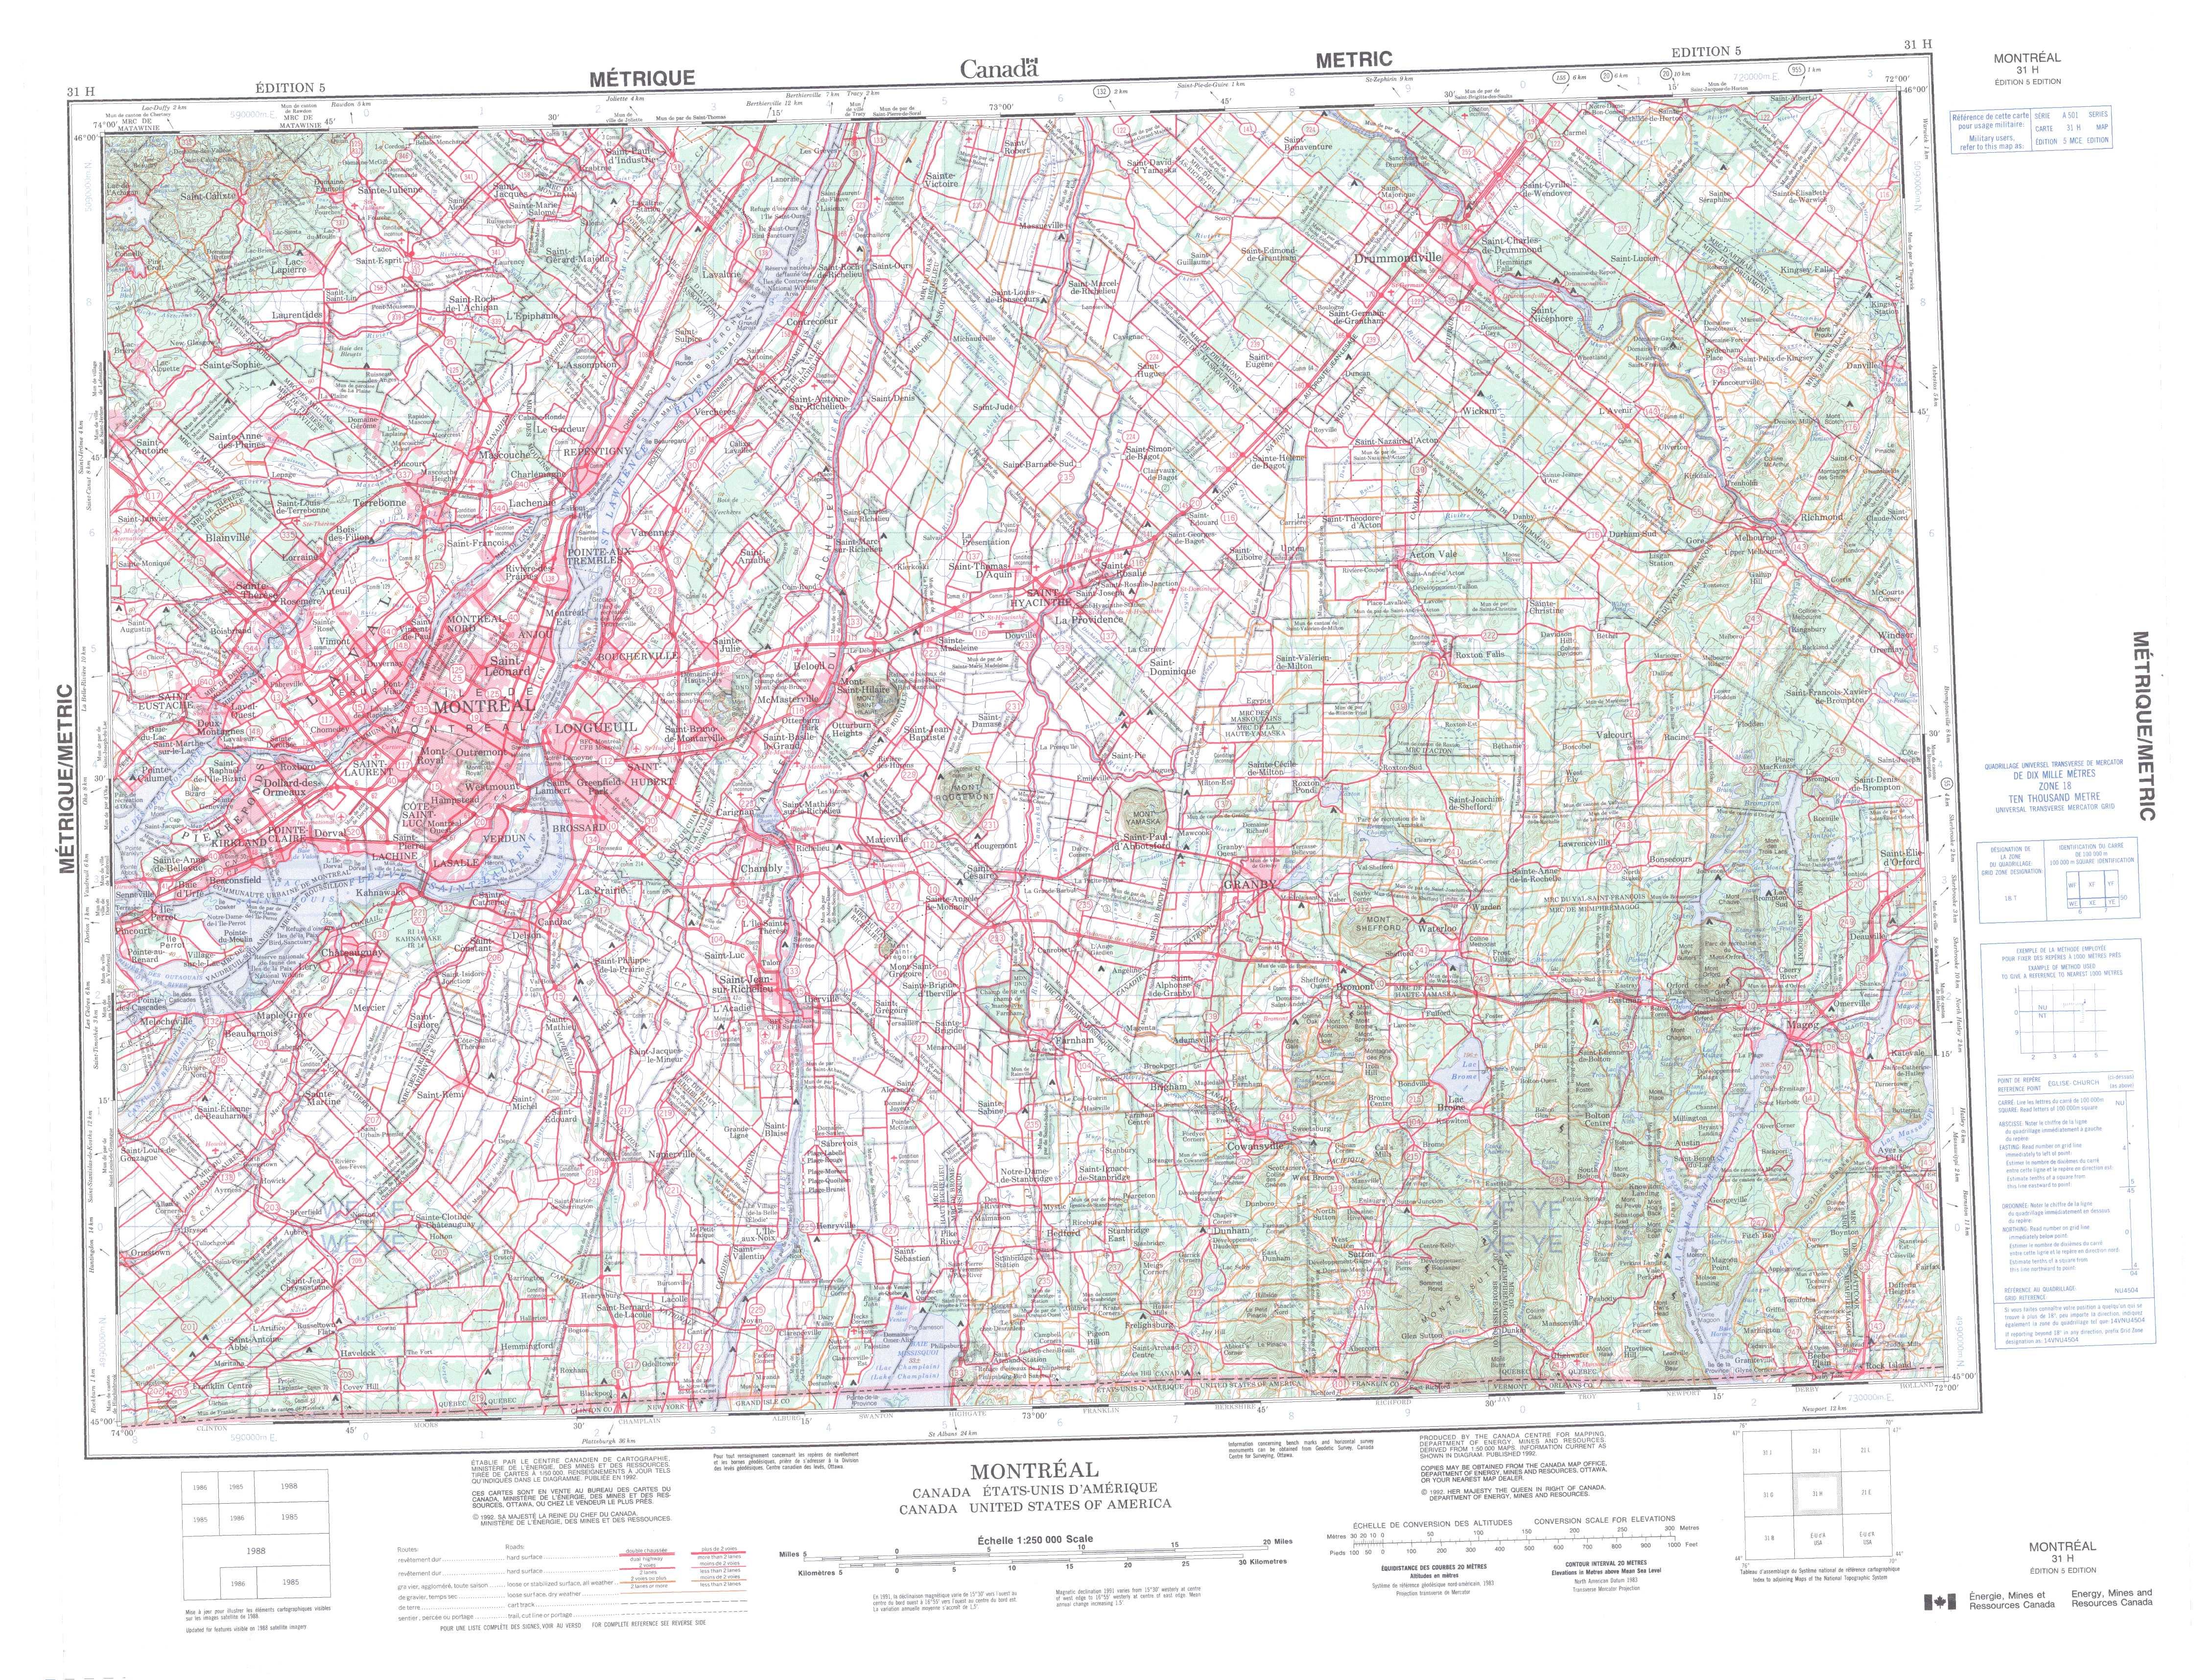 Printable Topographic Map Of Montreal 031H, Qc - Printable Topo Maps